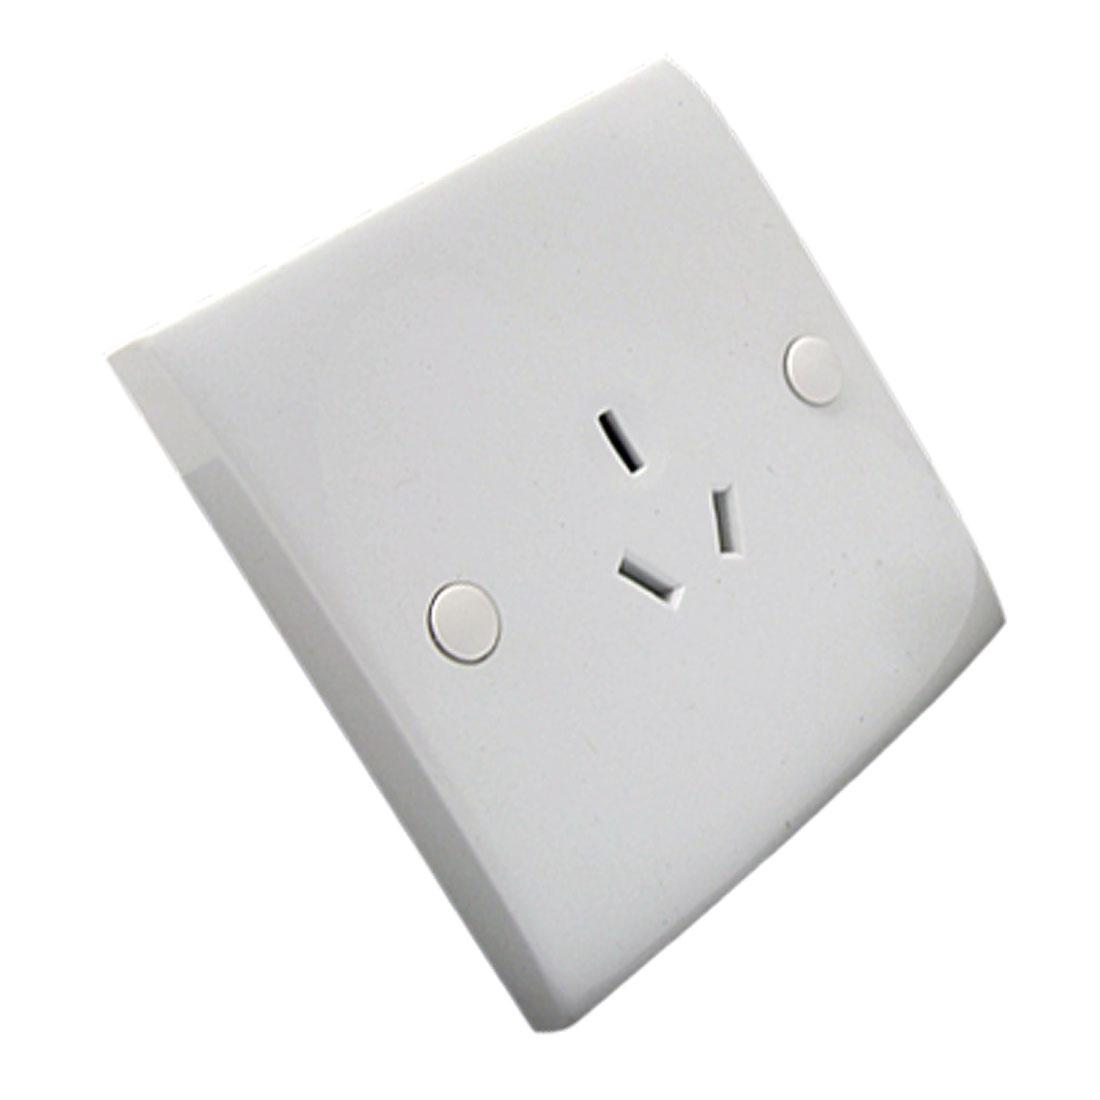 White 3 Pin Australia AU Socket Outlet Wall Plate Panel 10A 250V